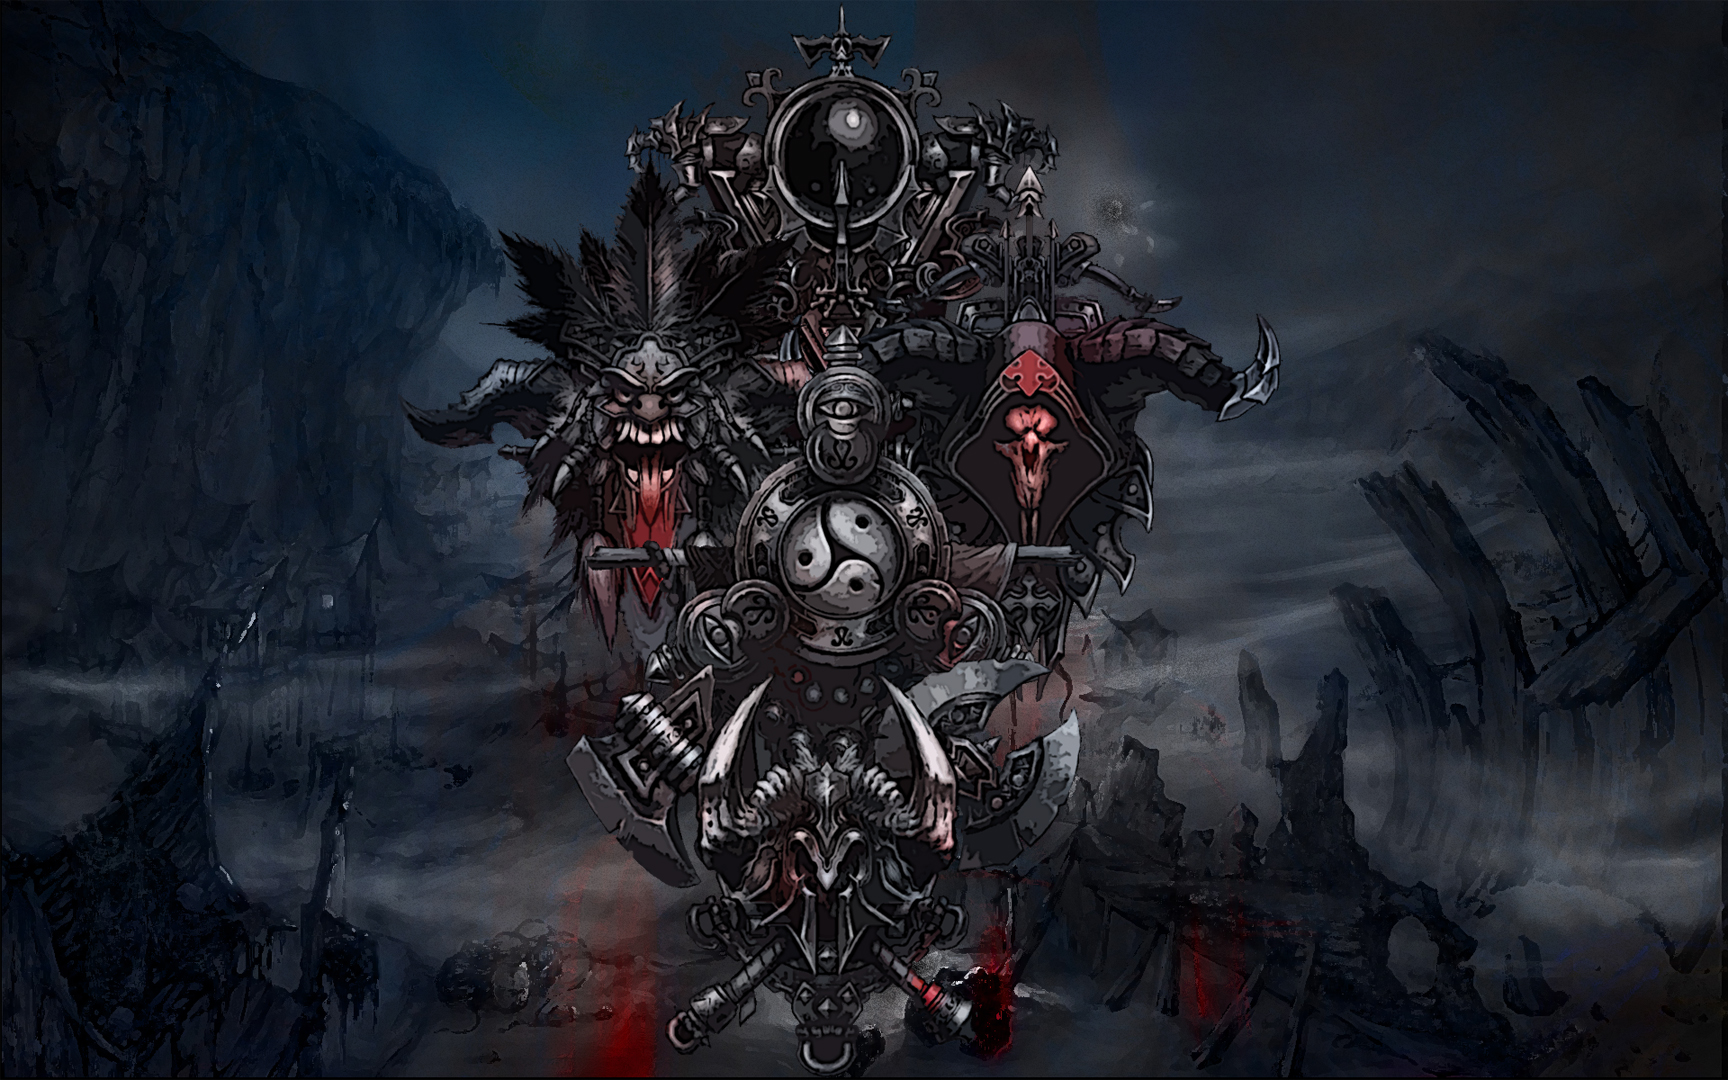 Fantasy Art Necromancers Wallpapers Hd Desktop And: Diablo 3 Wizard Wallpaper